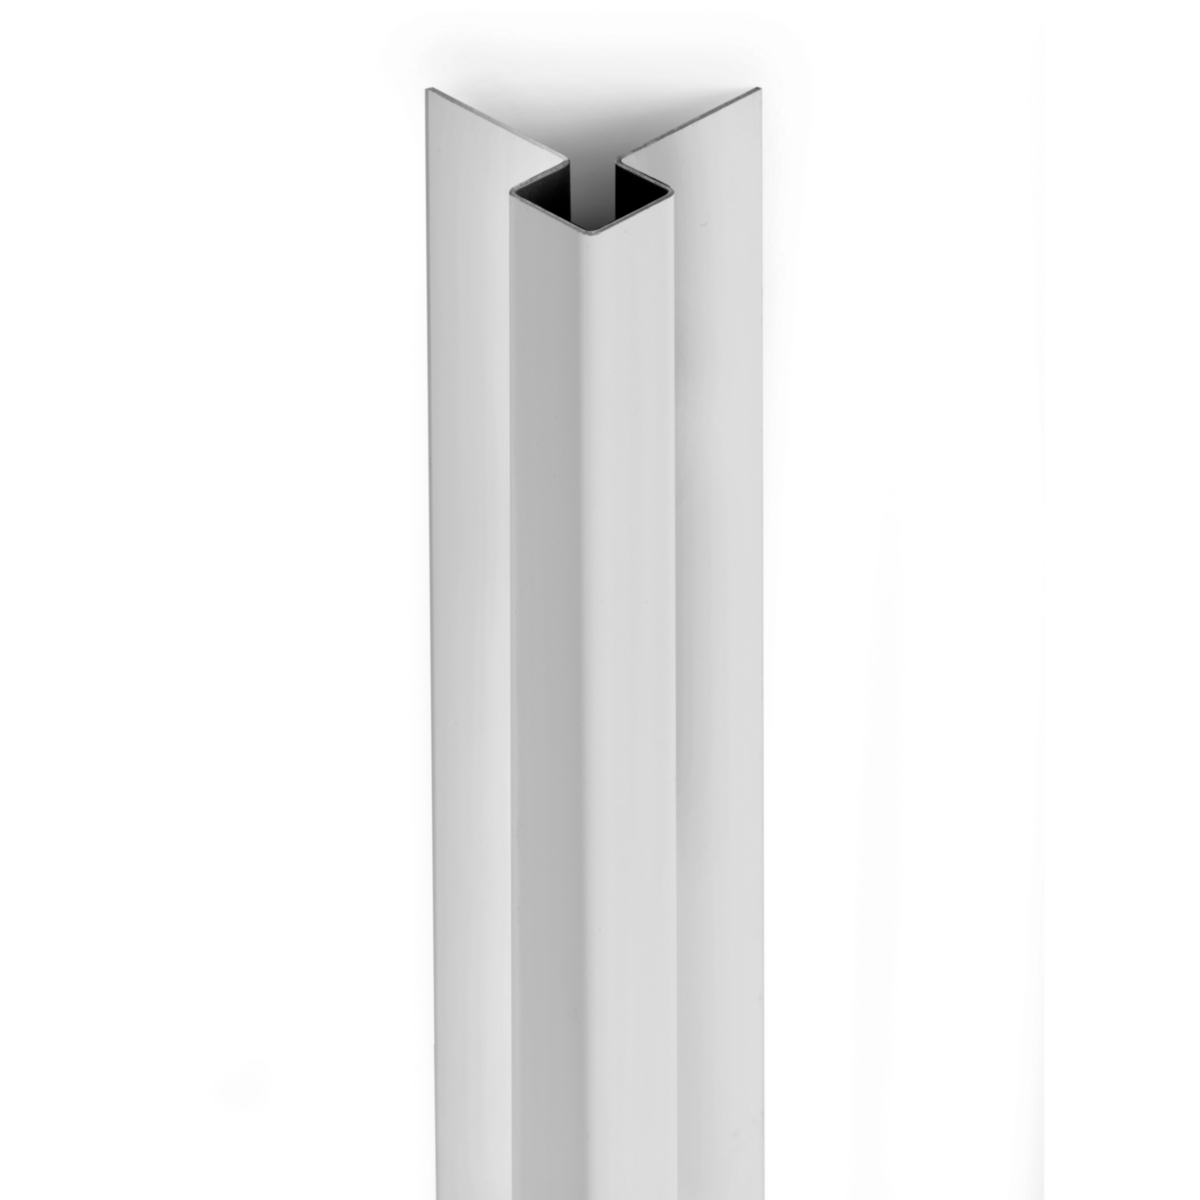 angle ext rieur cedral click aluminium c07 3m eternit france pornic 44210 d stockage habitat. Black Bedroom Furniture Sets. Home Design Ideas